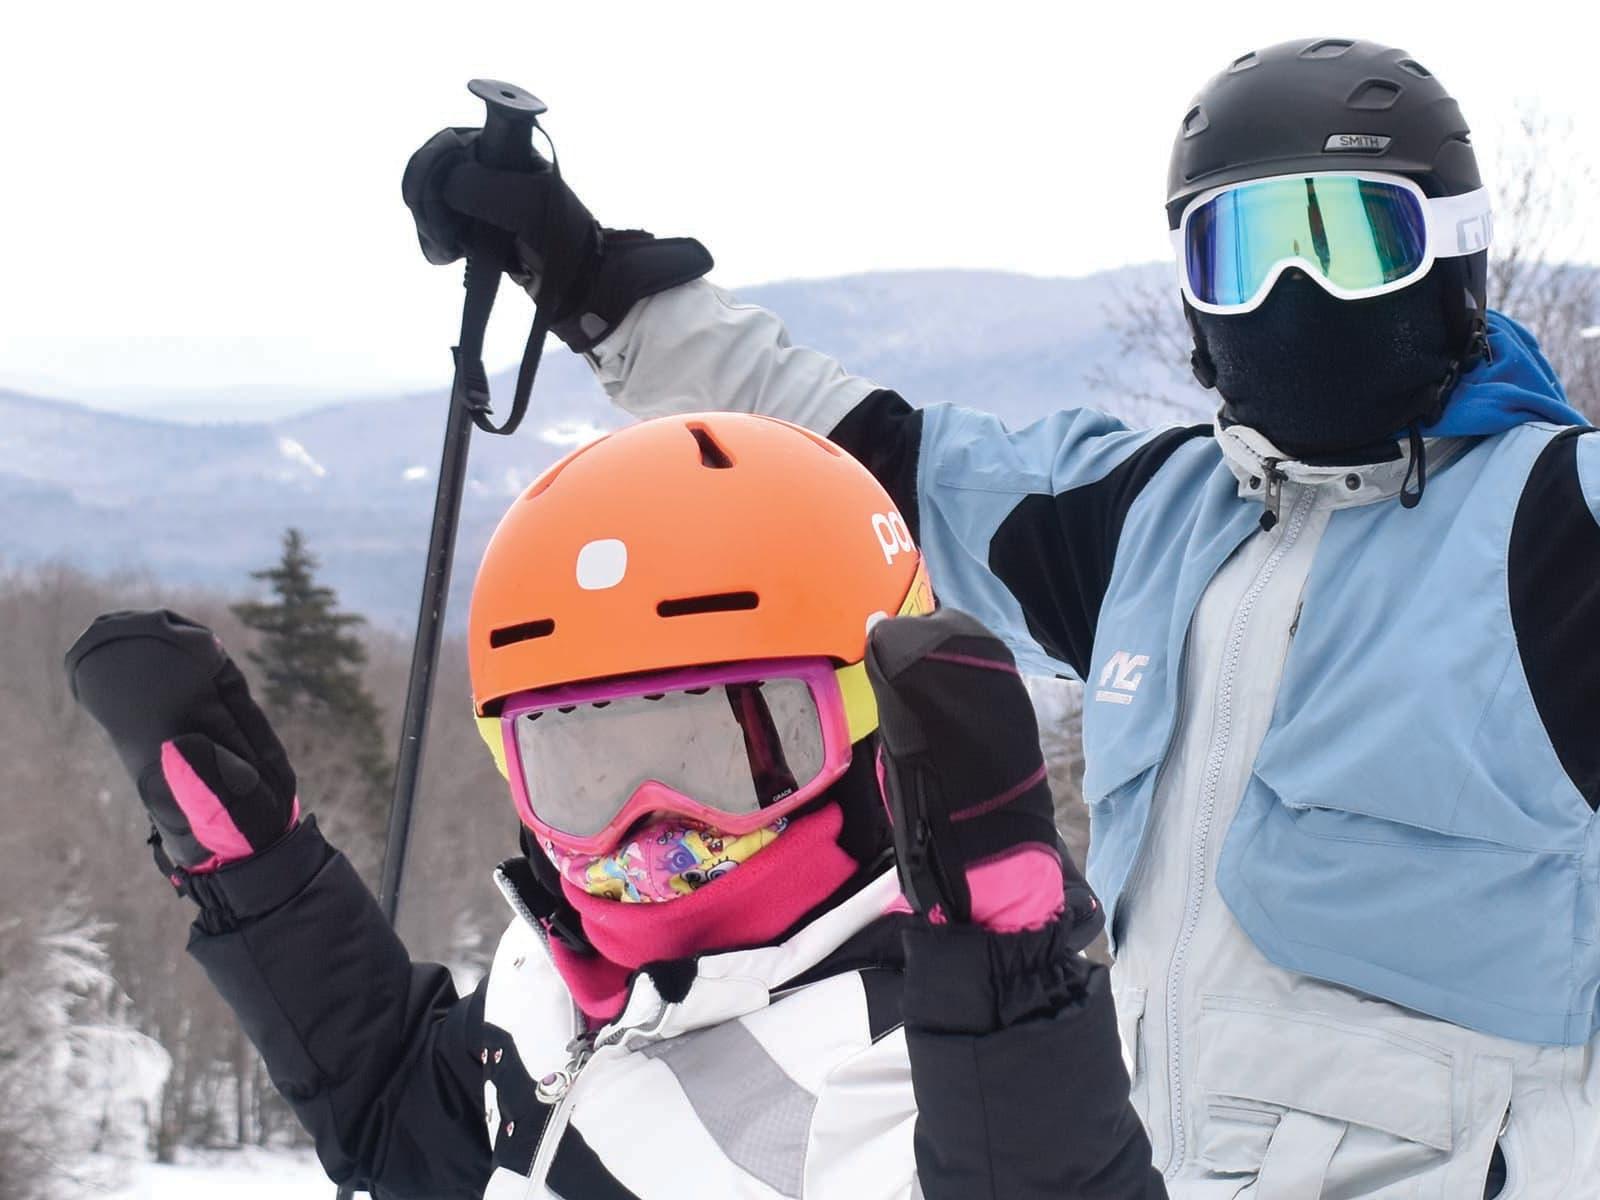 How Long Does A Ski How Long Does A Ski/Snowboard Helmet Last